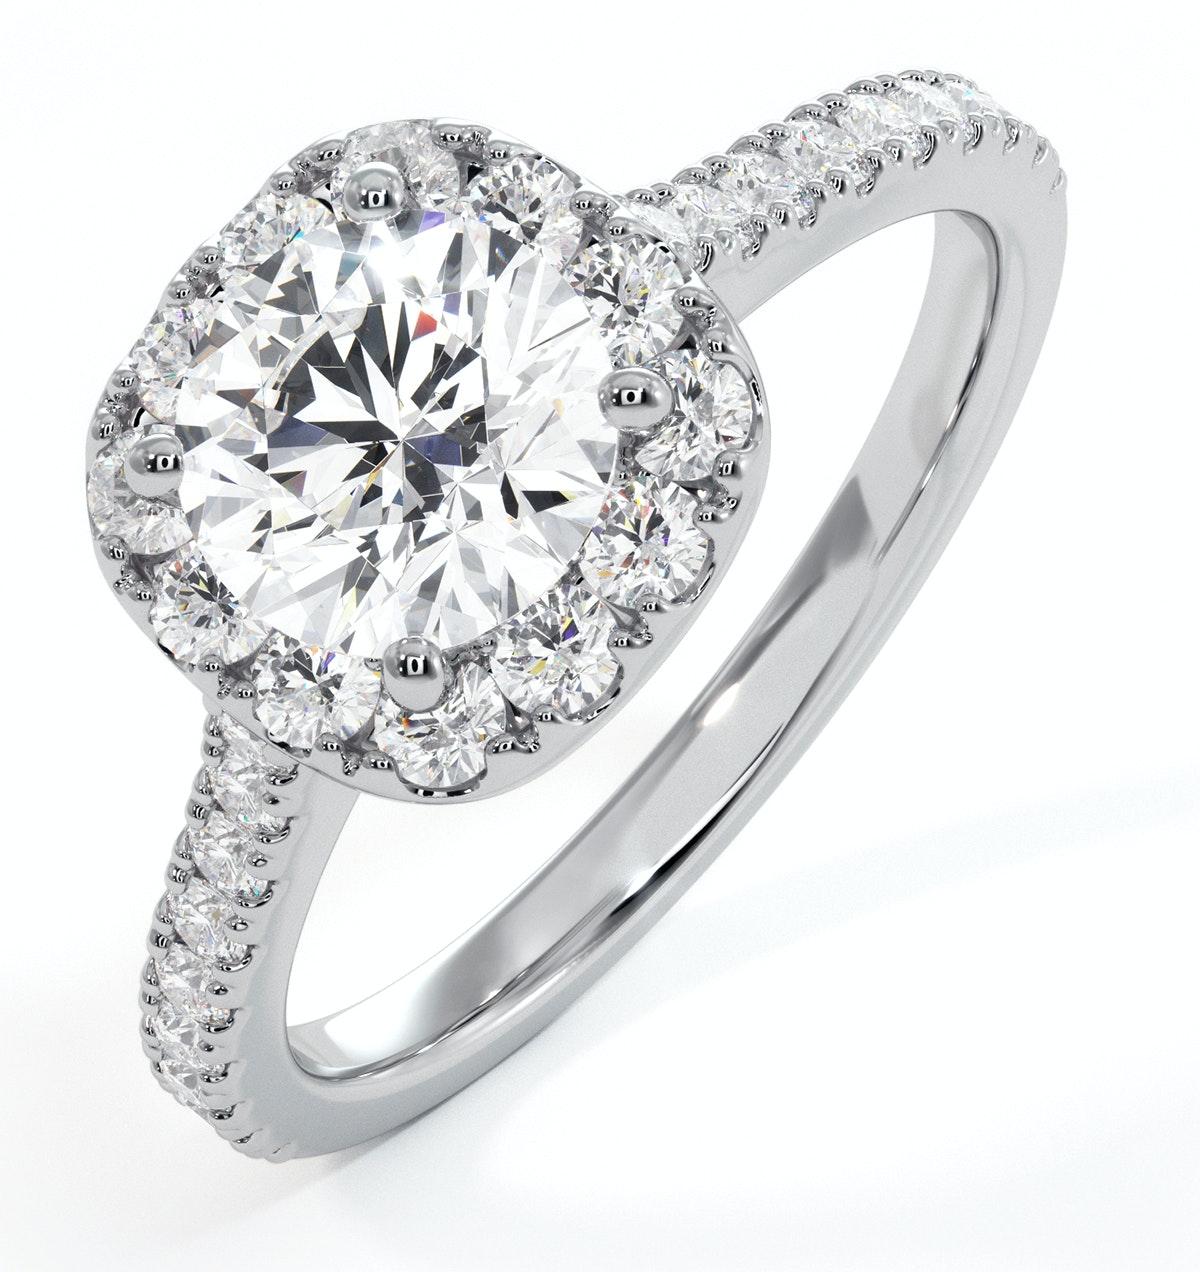 Elizabeth GIA Diamond Halo Engagement Ring 18K White Gold 1.50ct G/VS2